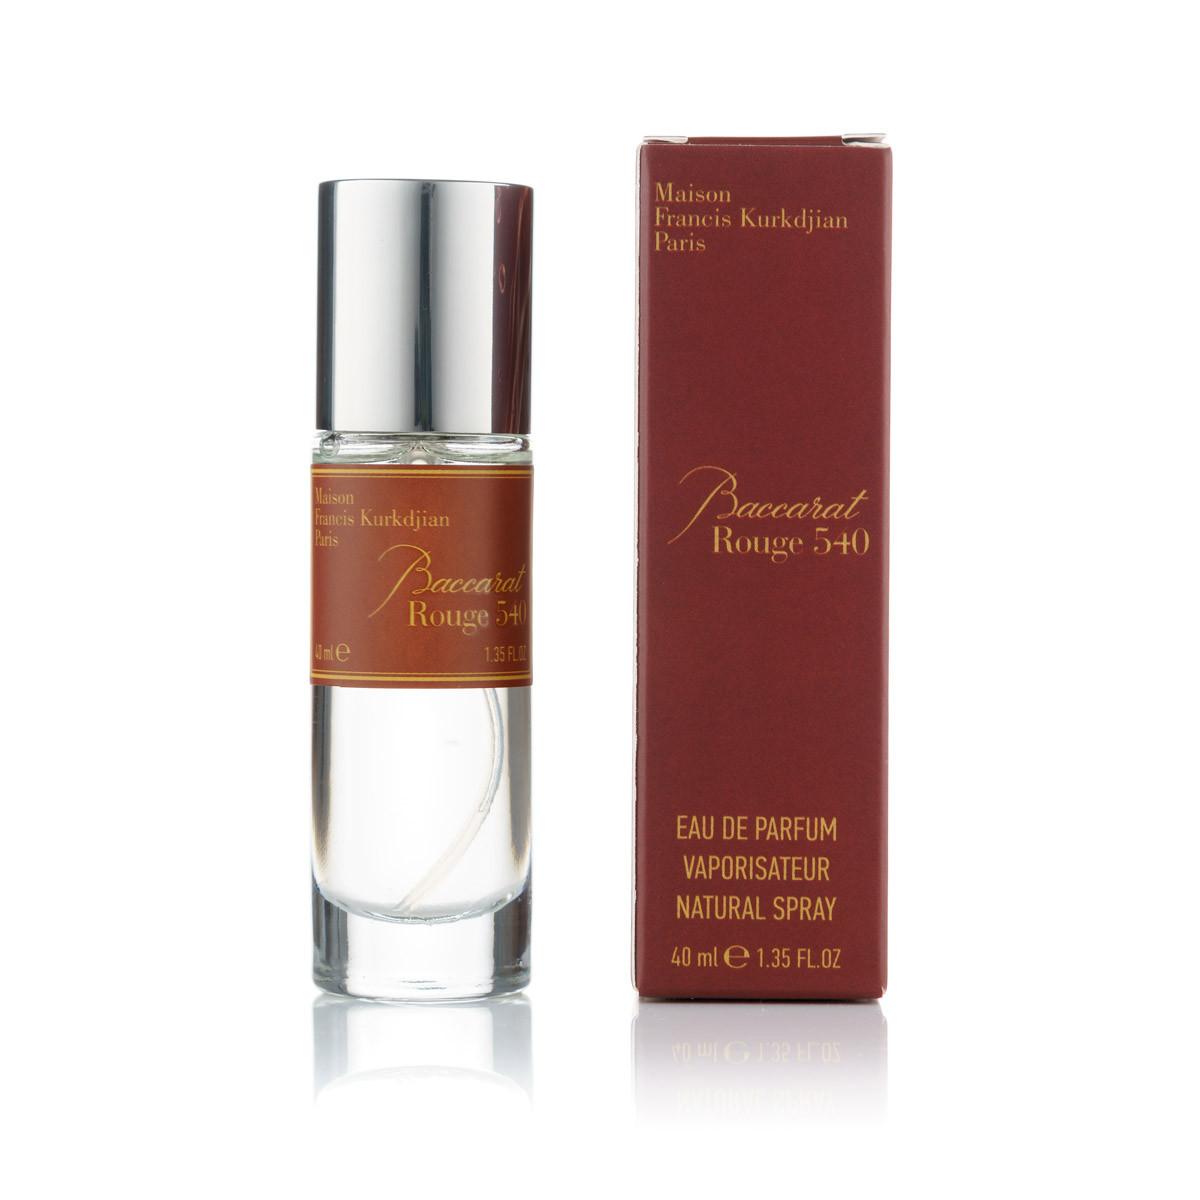 40 мл мини парфюм Maison Francis Kurkdjian Baccarat Rouge 540 (Унисекс)  (320)